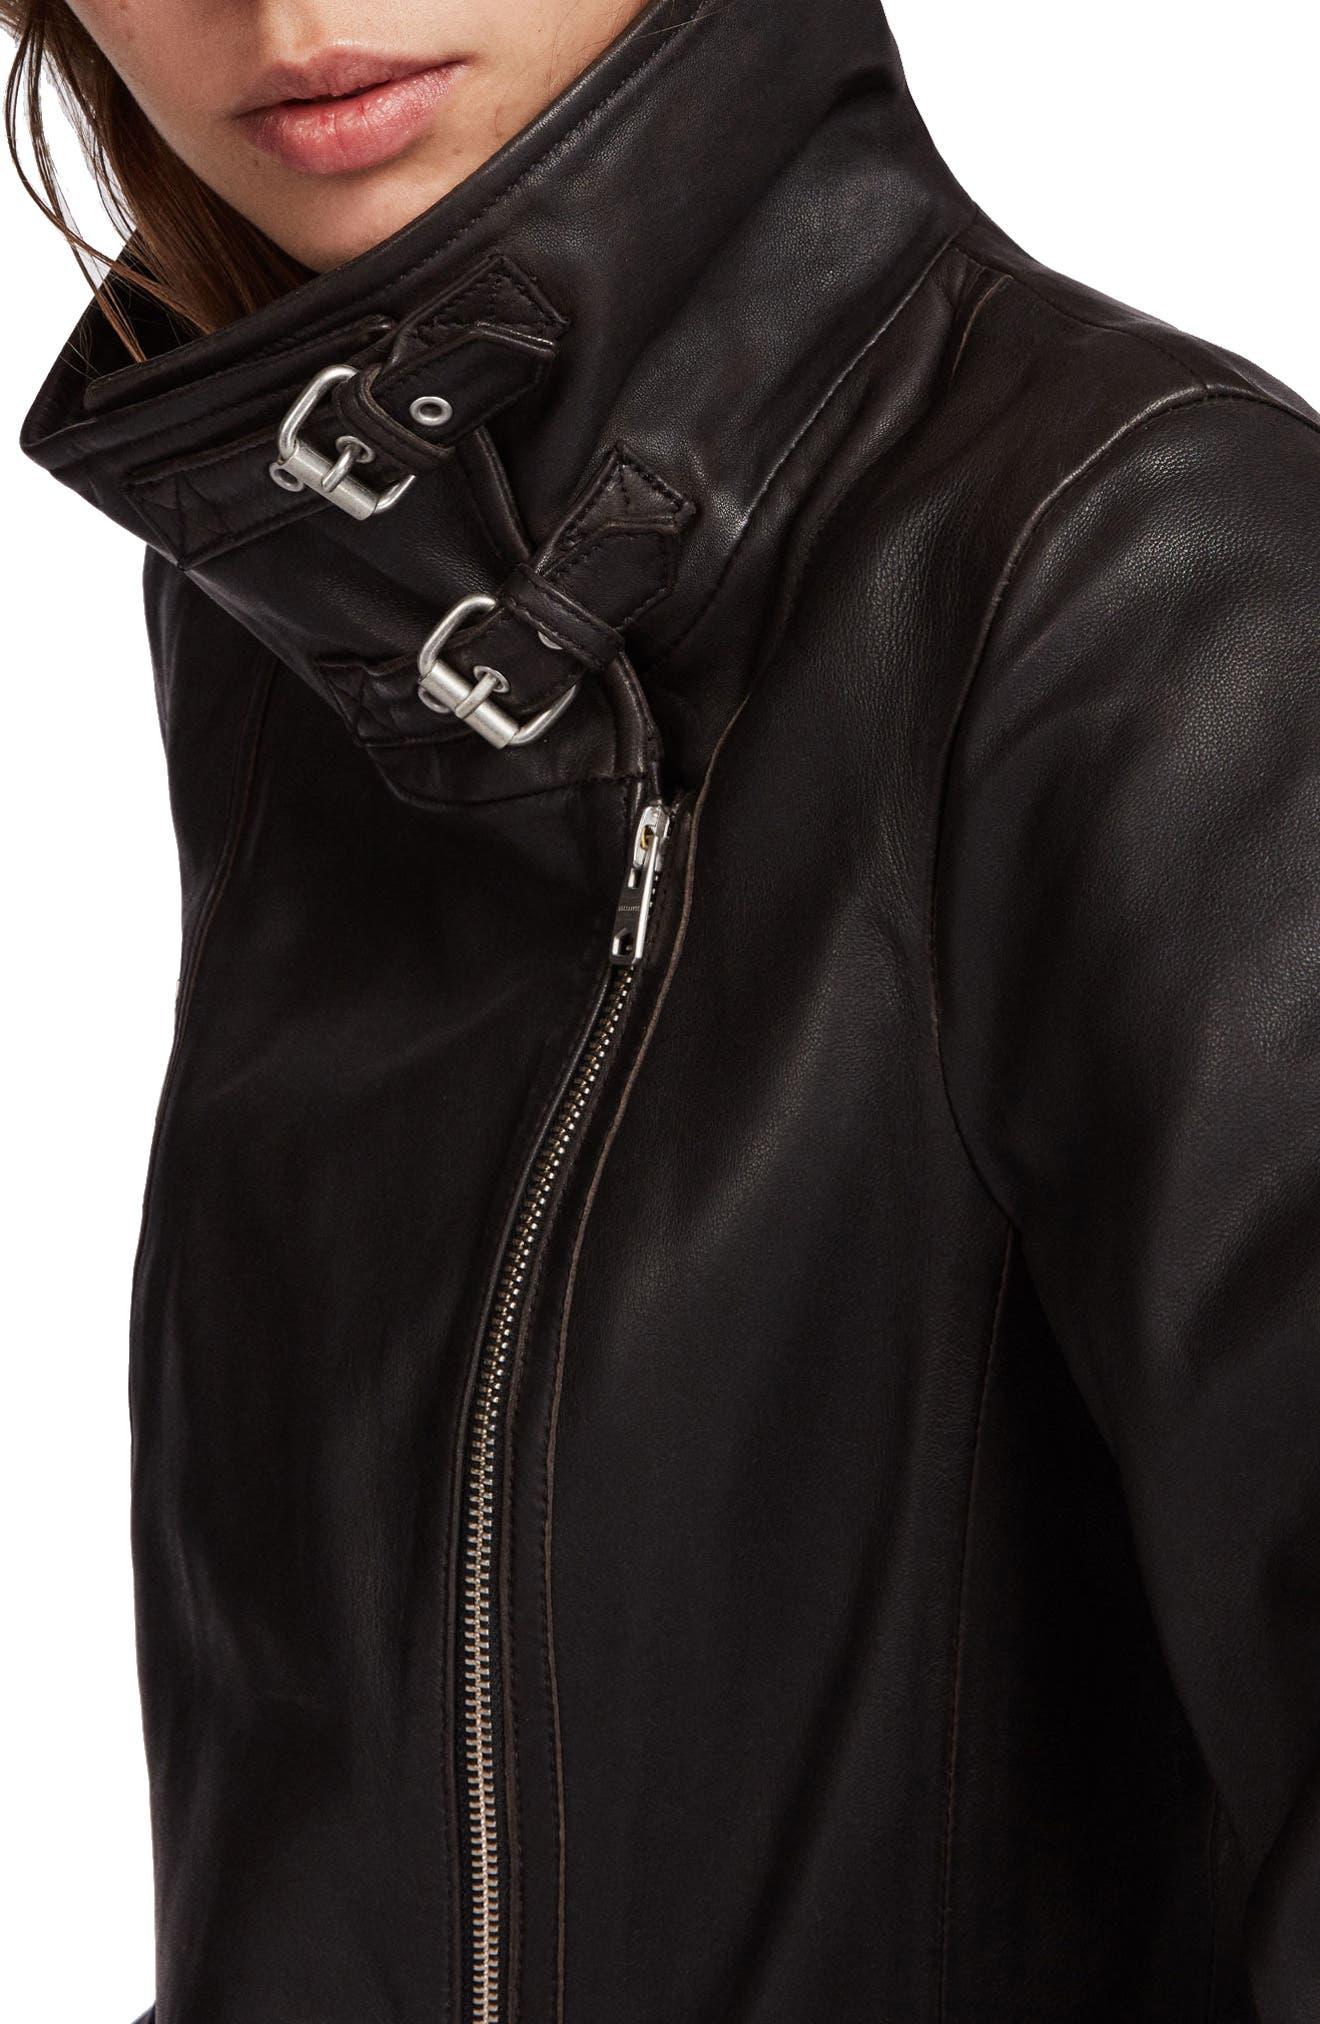 ALLSAINTS, Bales Leather Biker Jacket, Alternate thumbnail 4, color, BLACK